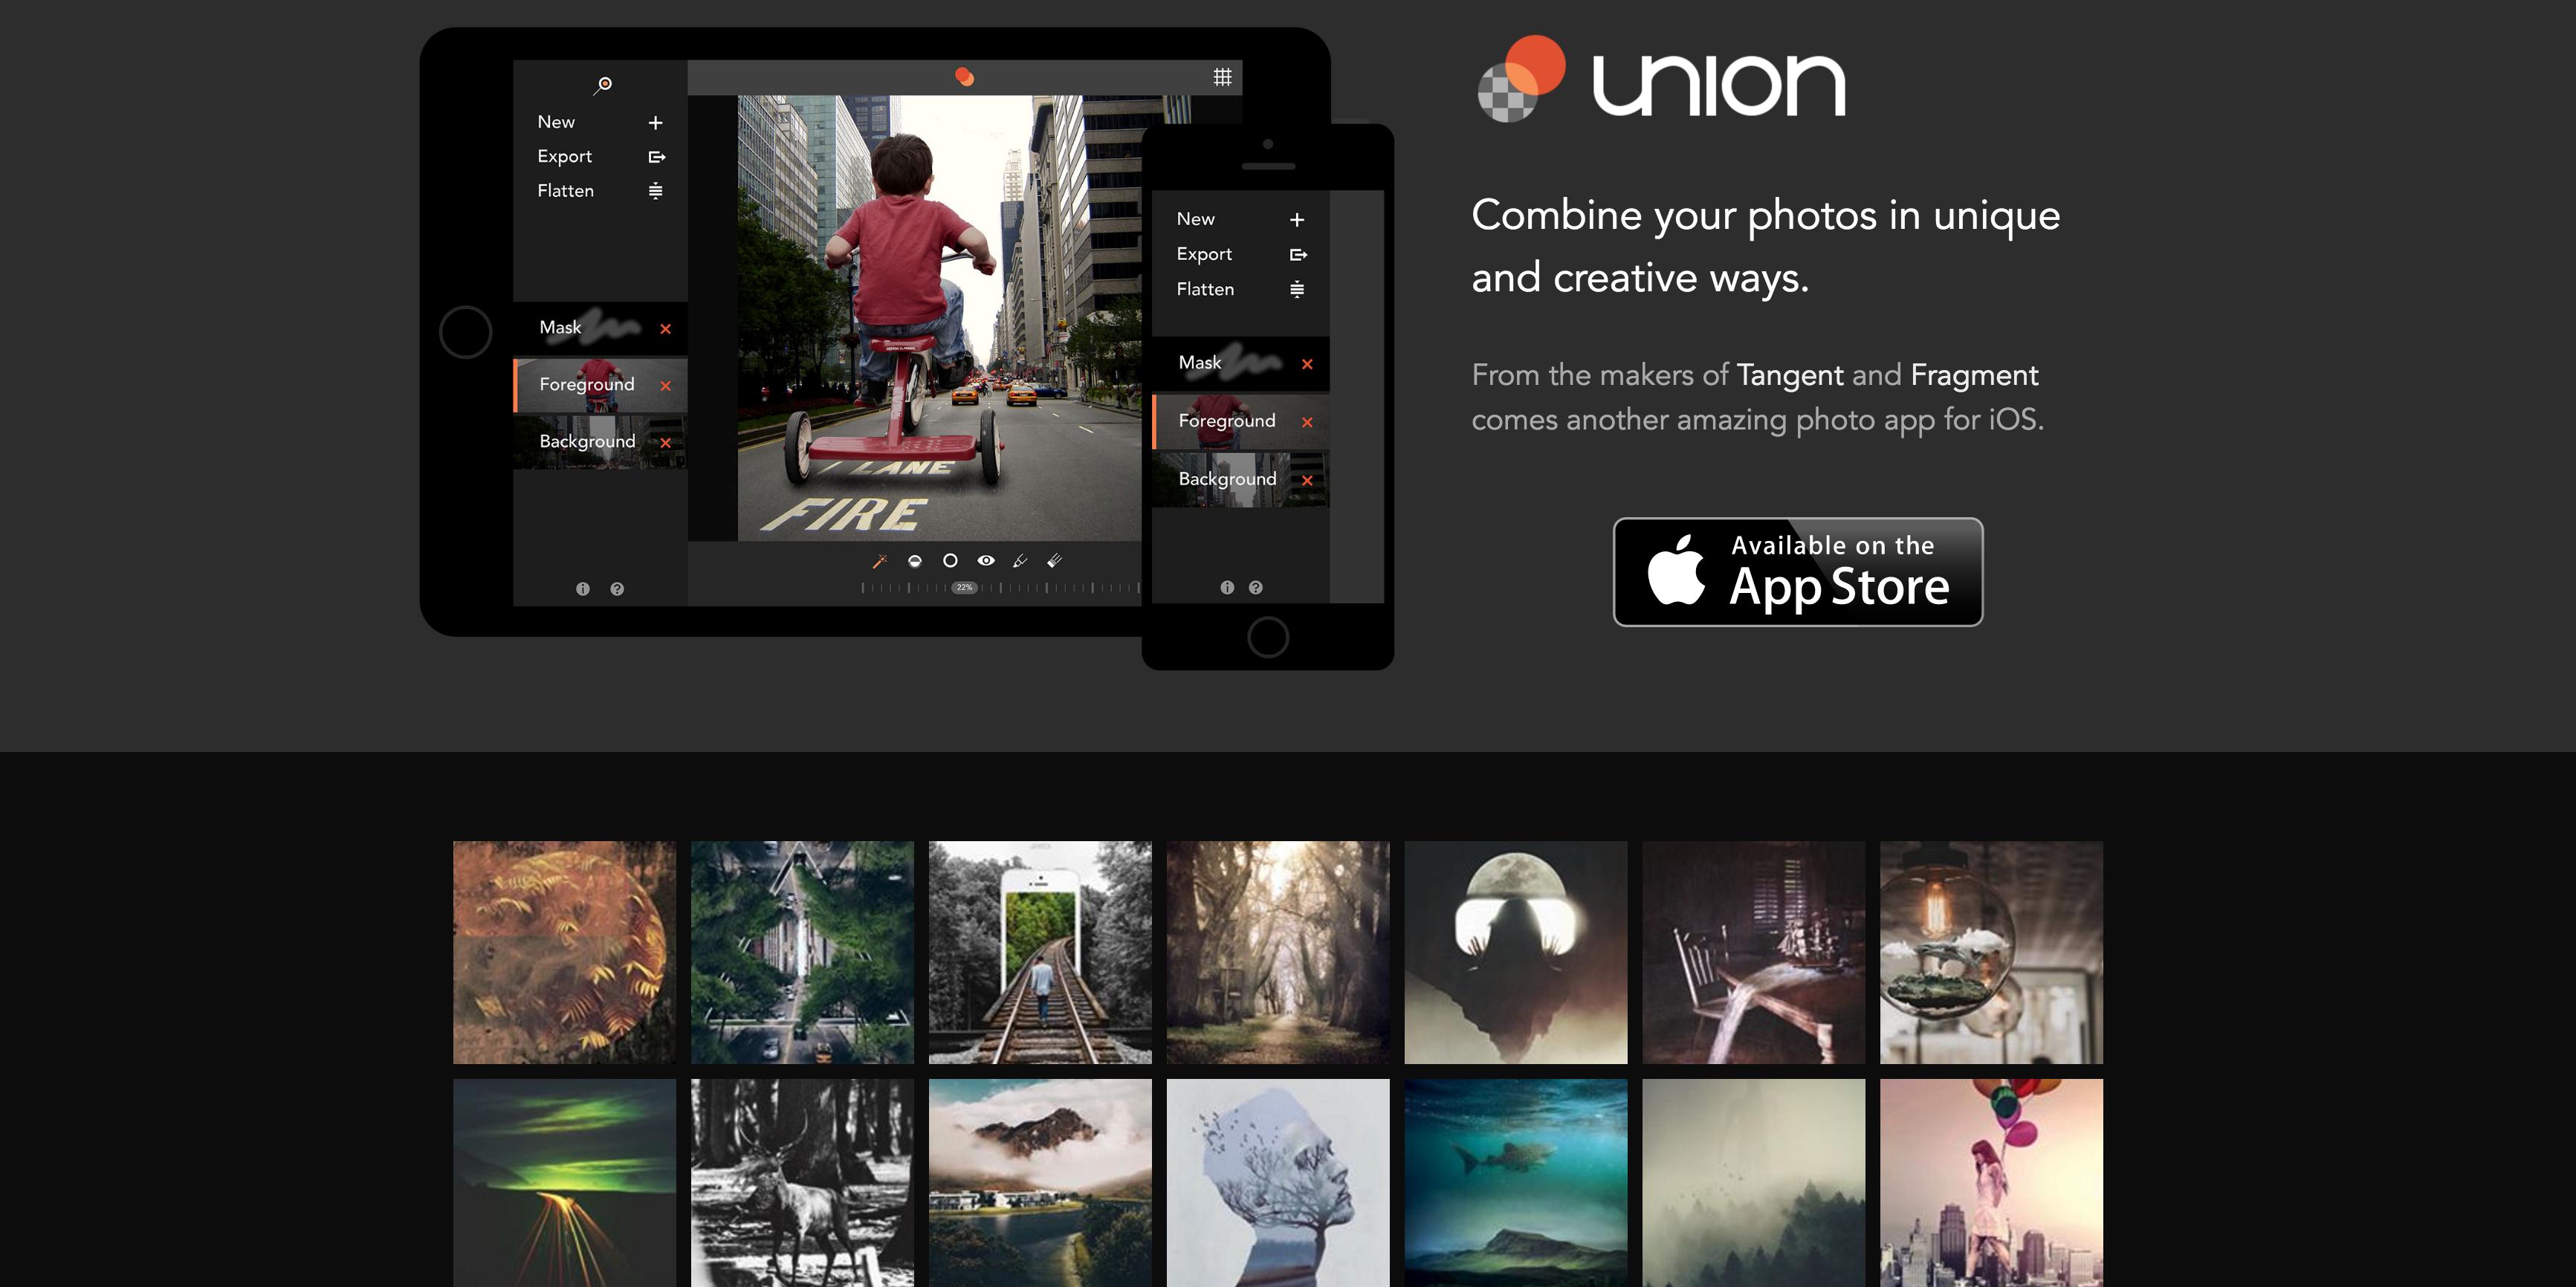 union-combine-blend-and-edit-photos-6